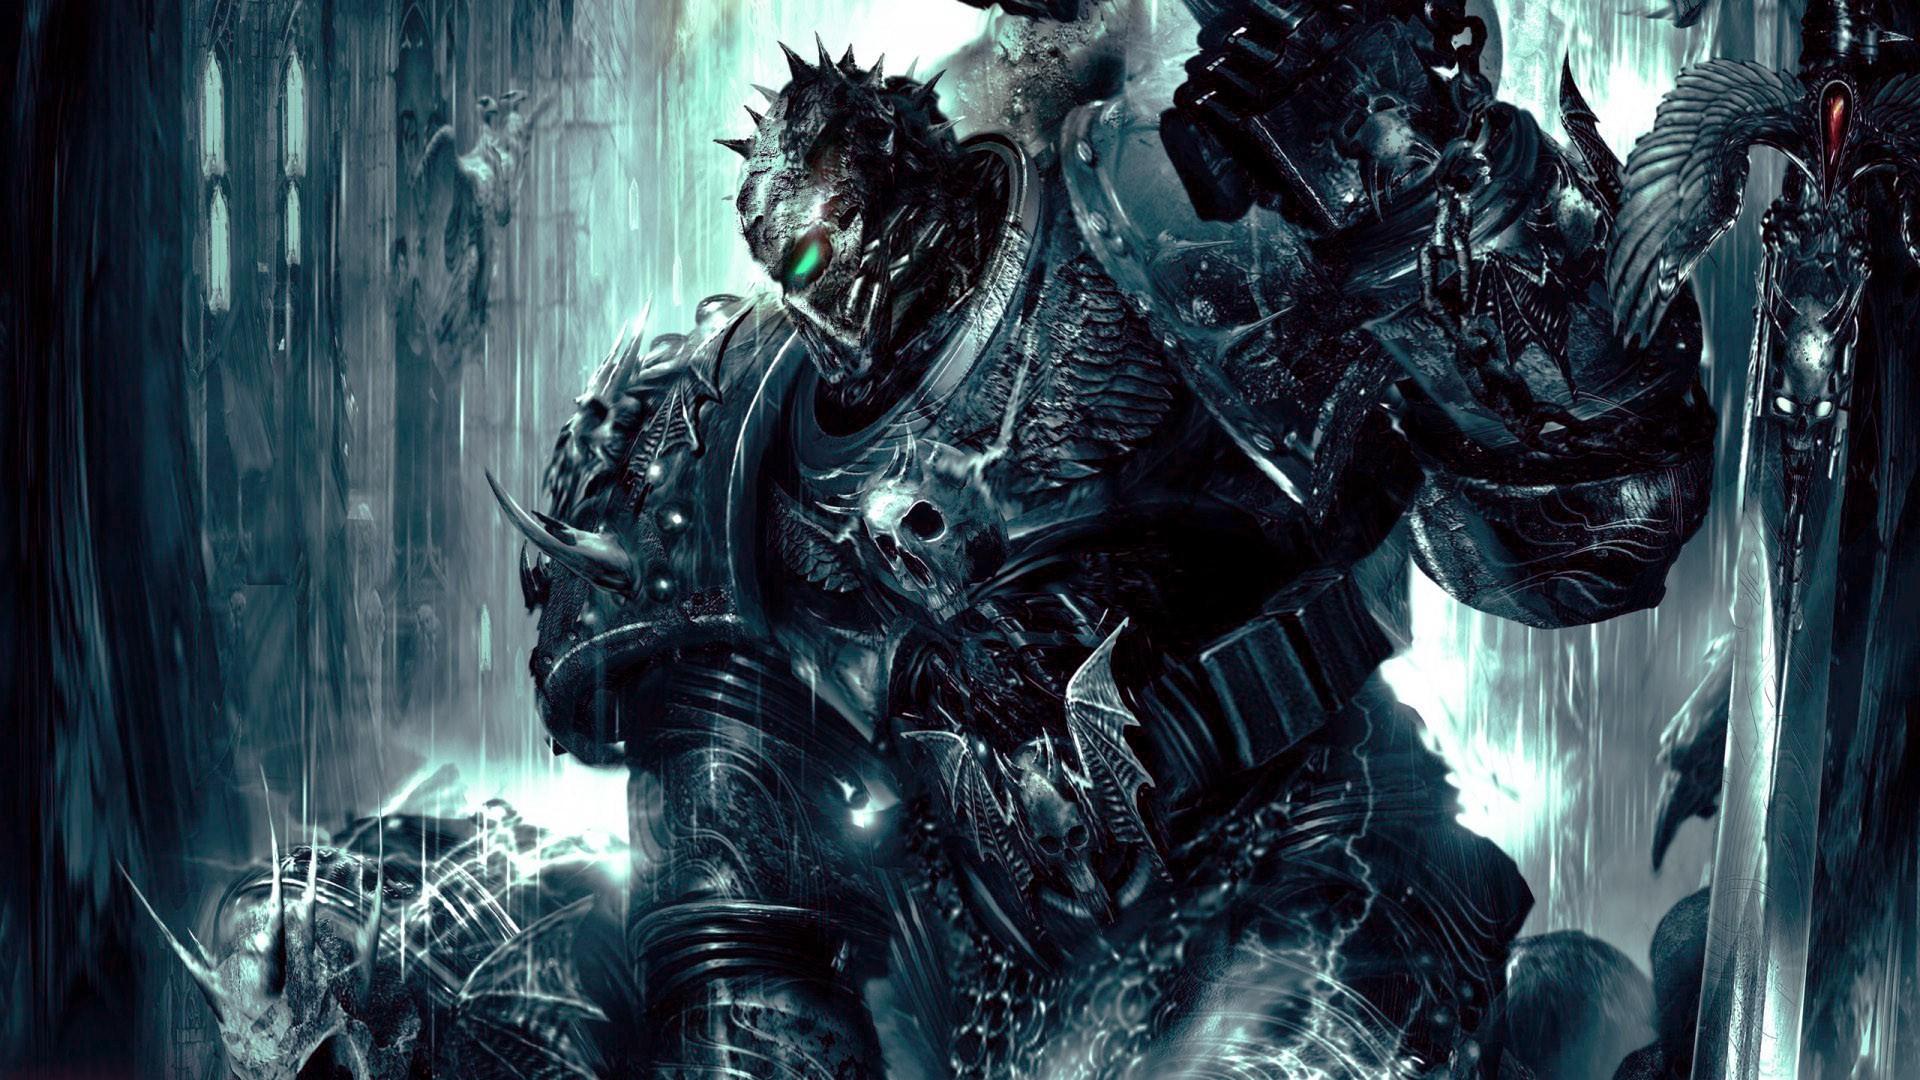 Fondos De Pantalla Criatura Warhammer 40 000 Historietas